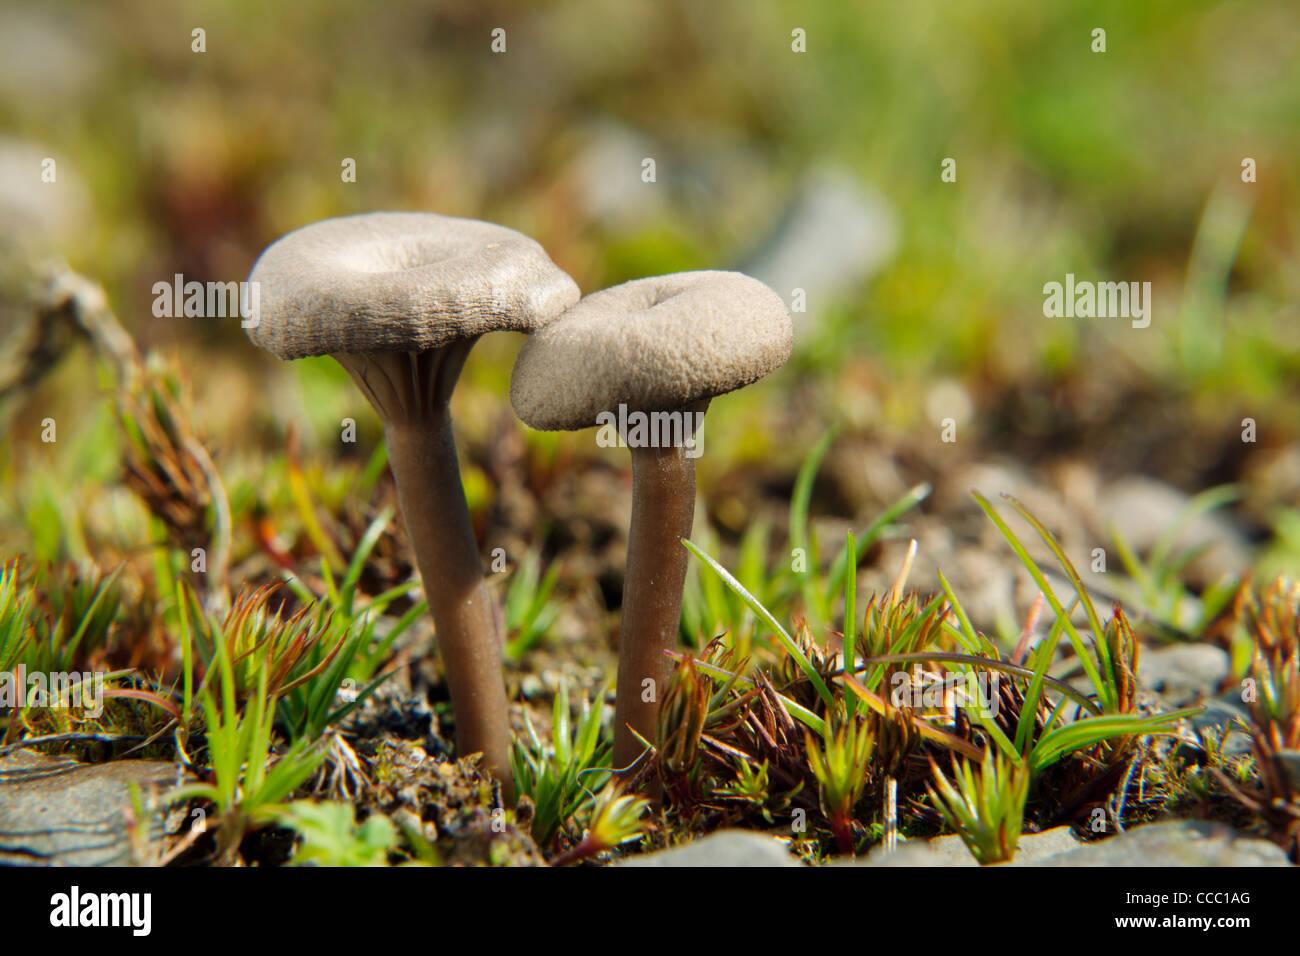 Clitocybe mushrooms - Stock Image